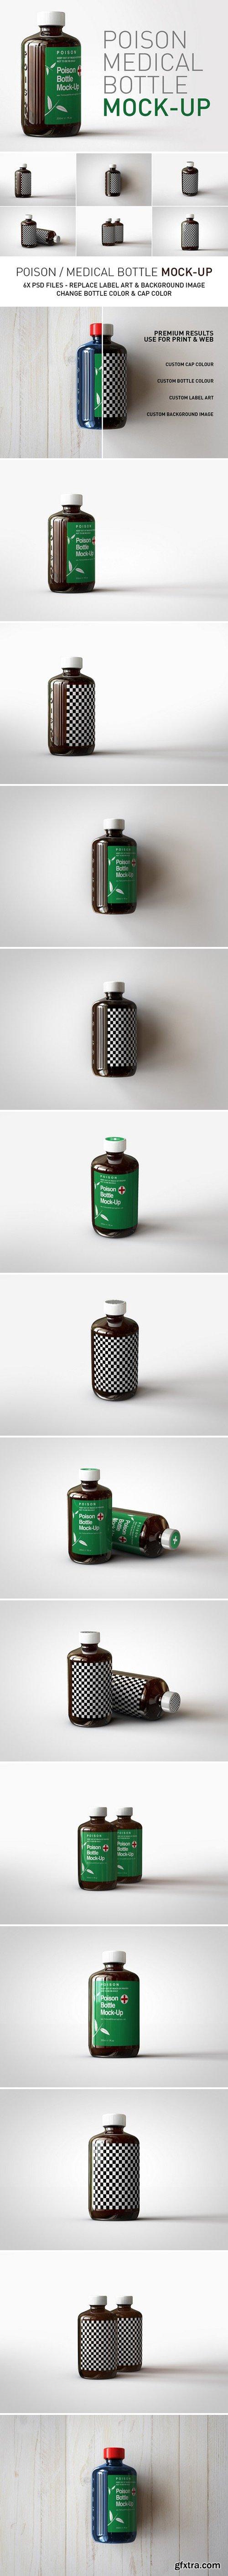 CM - Amber Poison Bottle Mock-Up 2455356